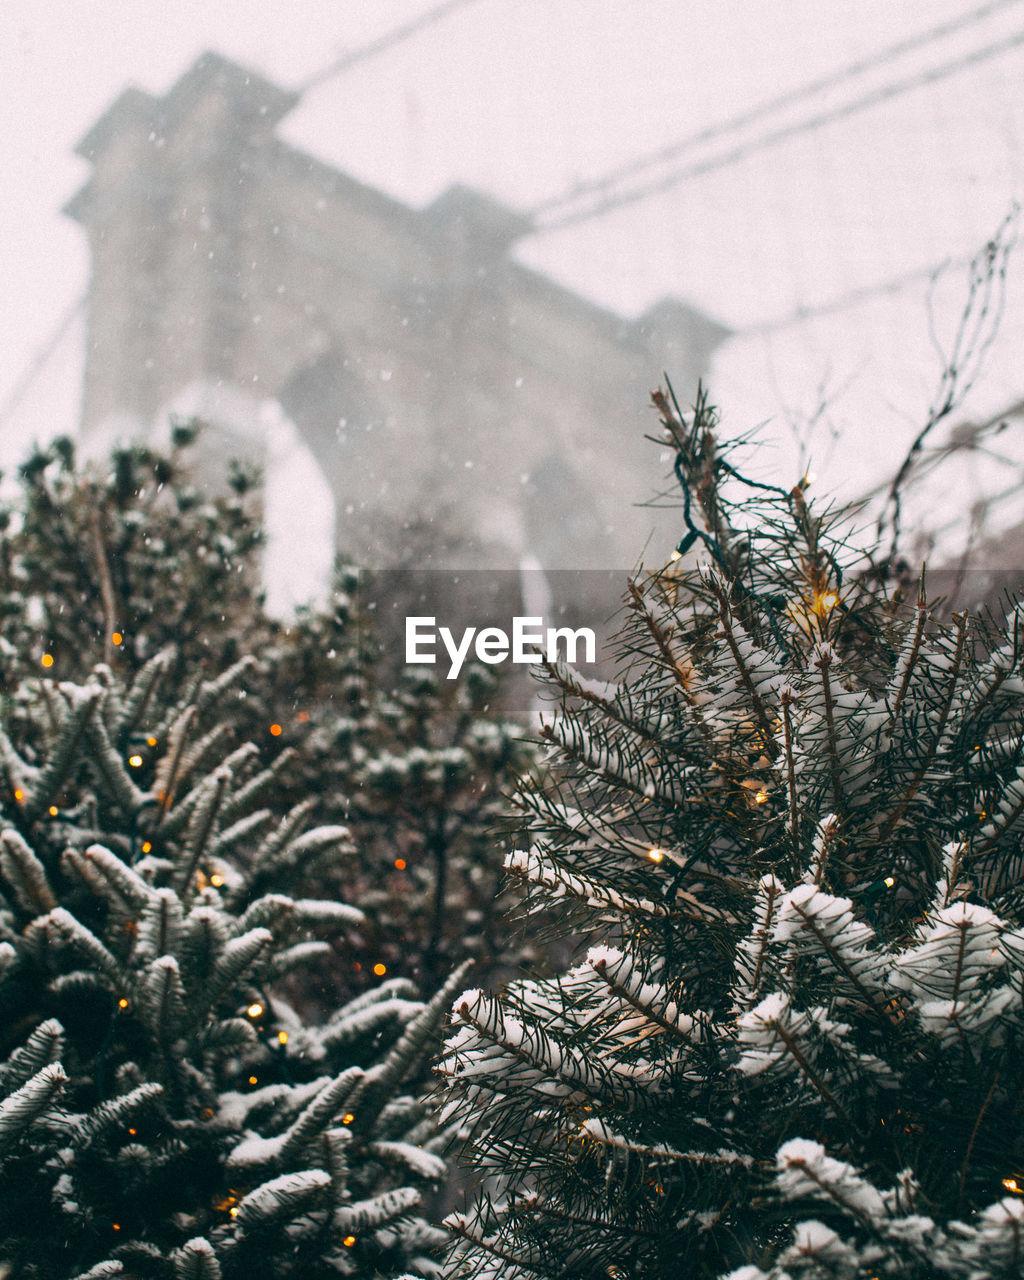 Trees against brooklyn bridge during winter